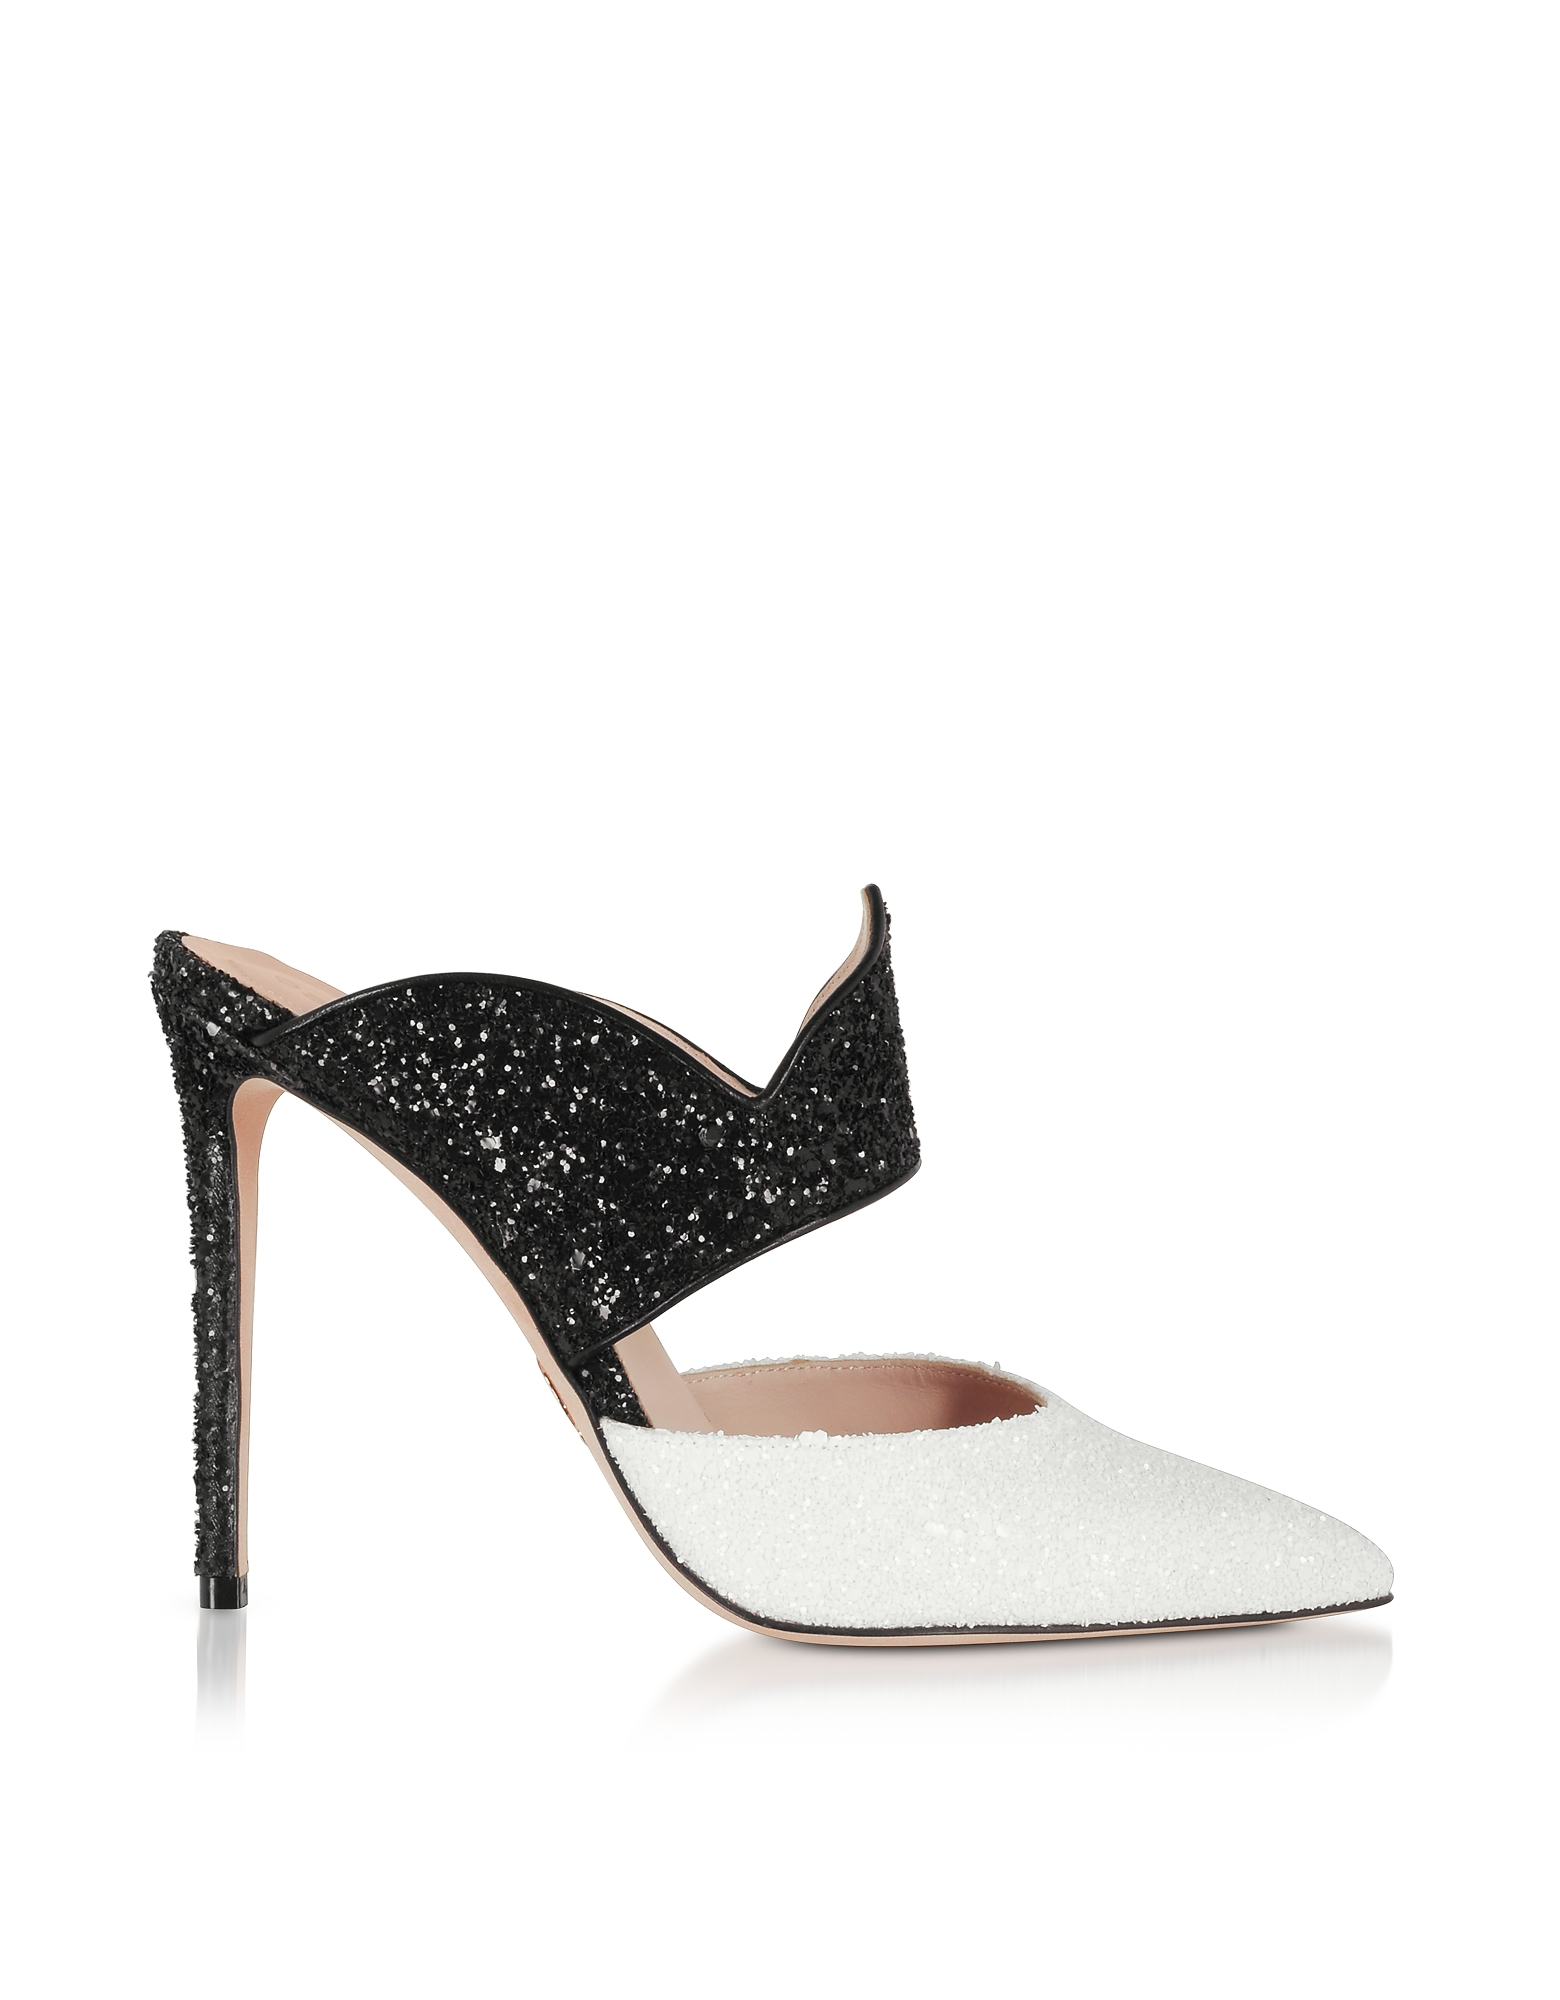 Brianne Noir & Blanc High Heel Mules